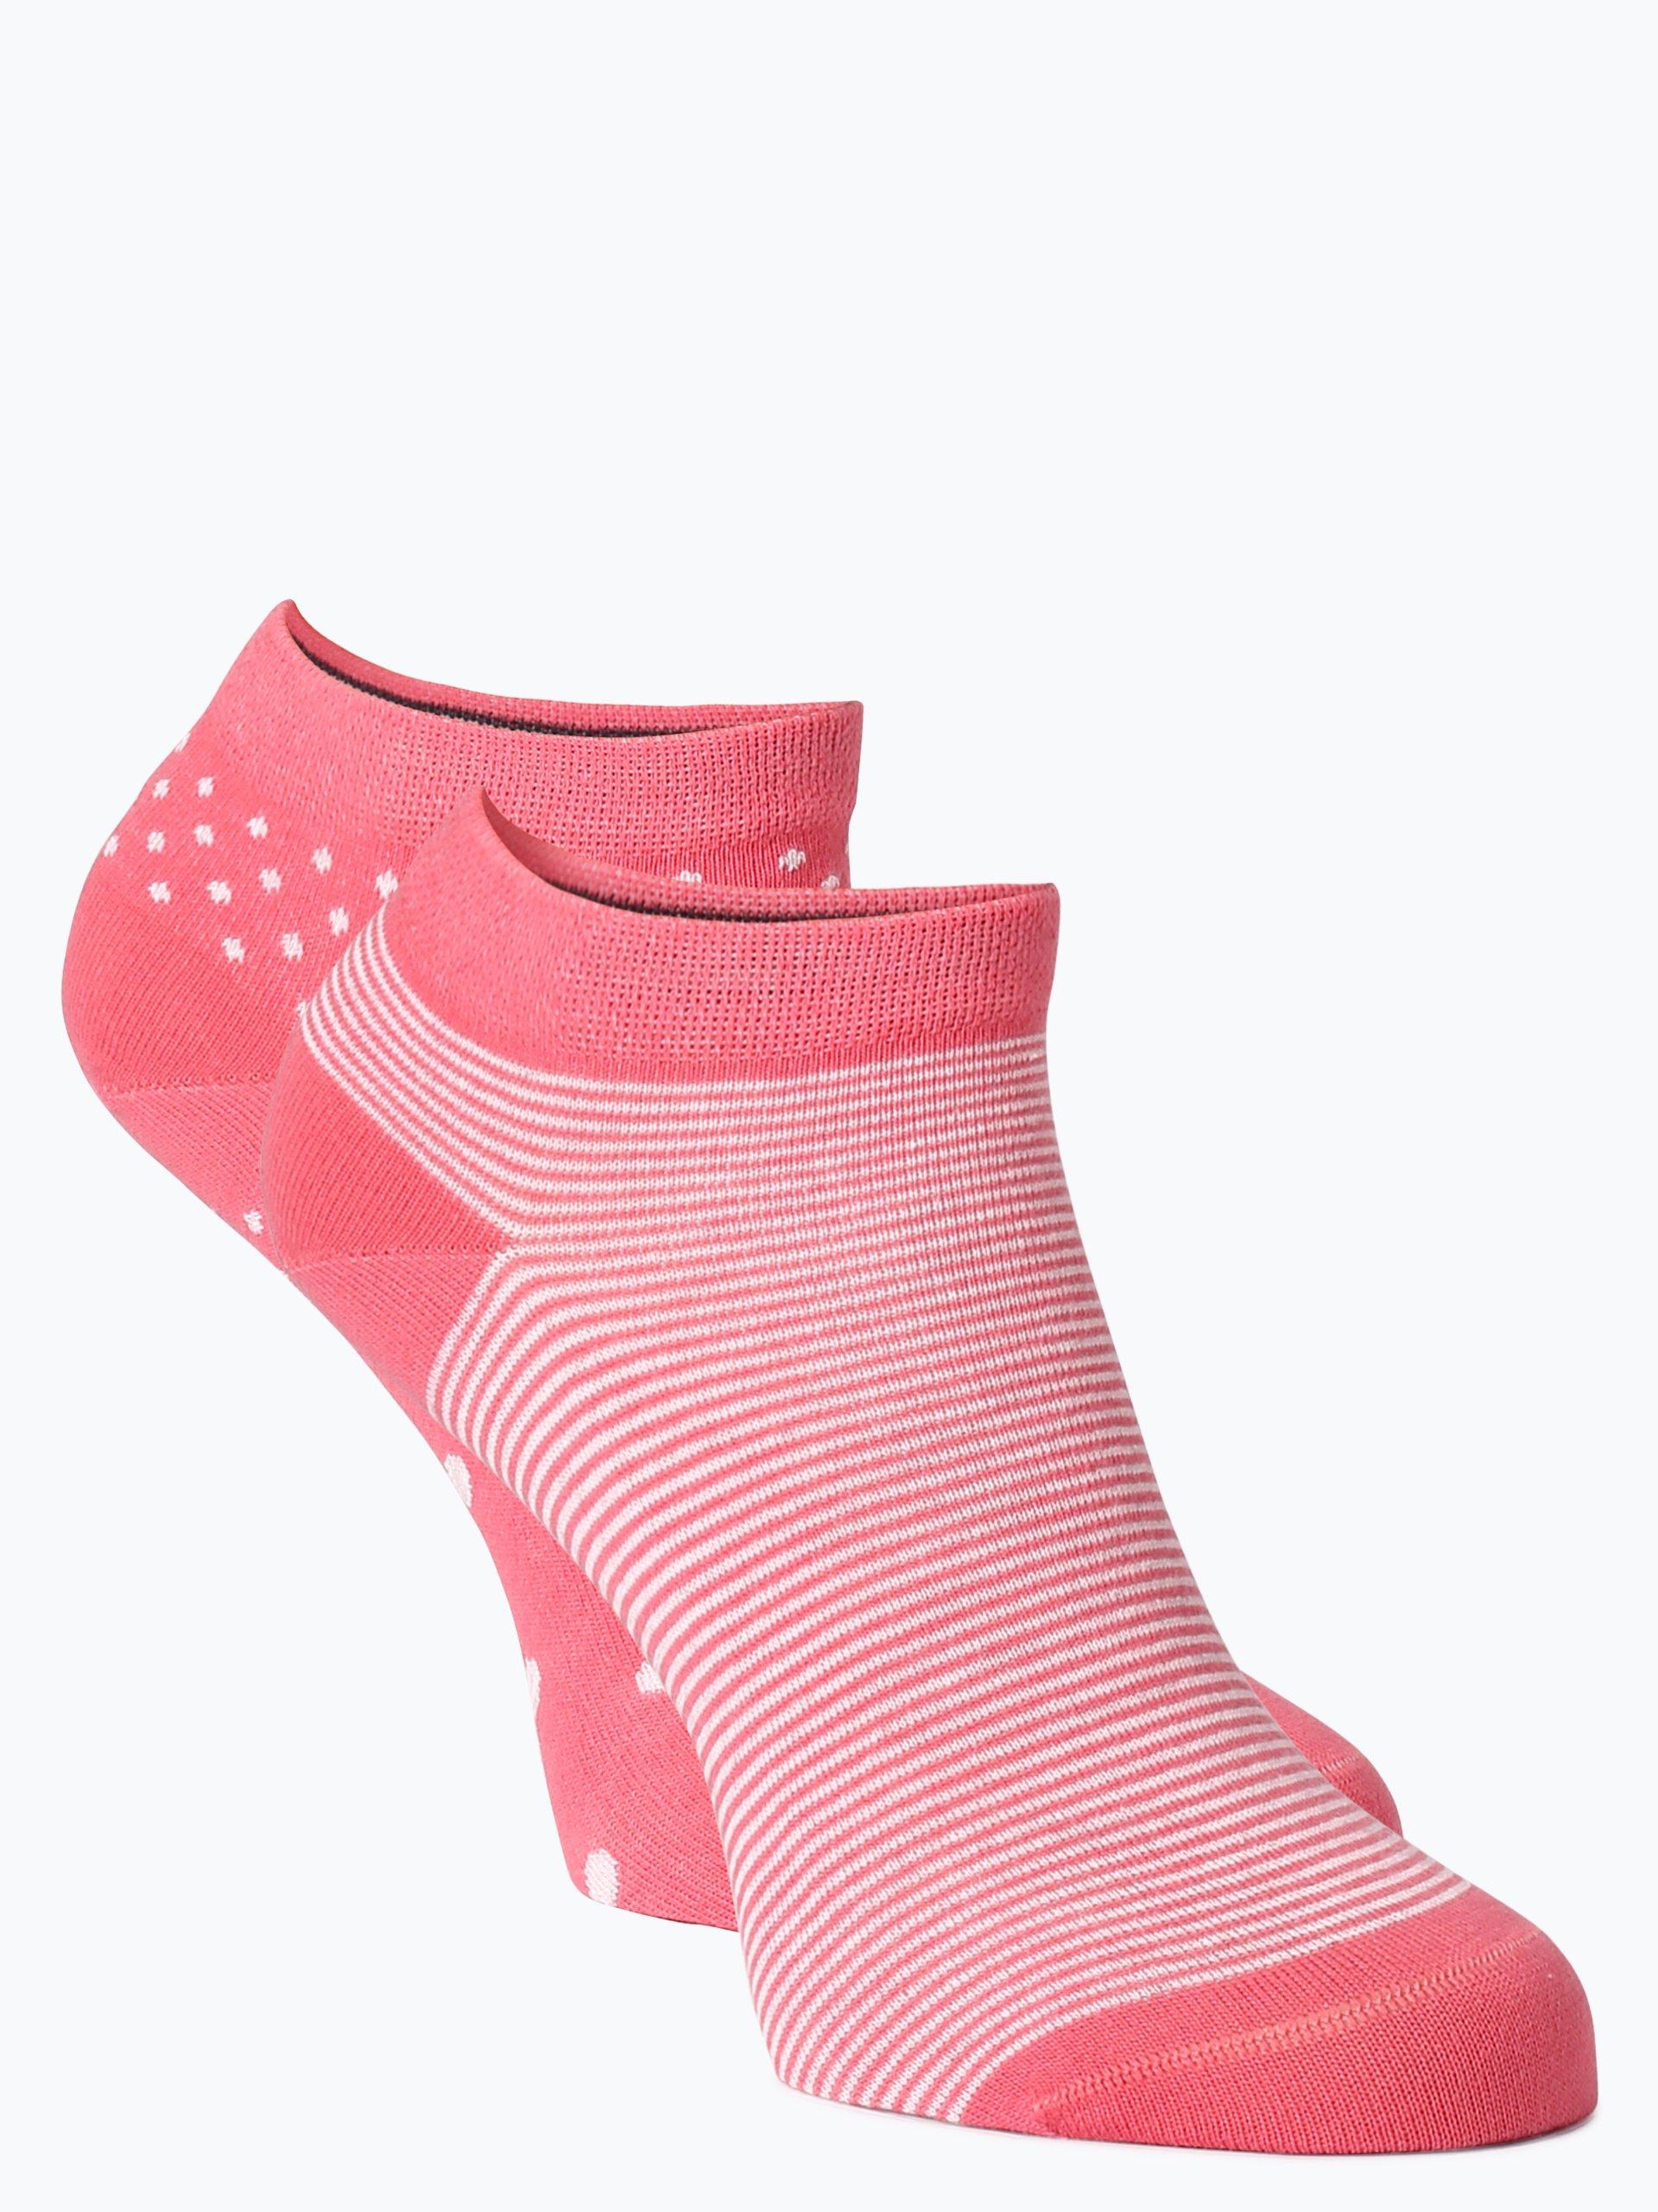 marc o 39 polo damen socken im 2er pack rosa gemustert online kaufen peek und cloppenburg de. Black Bedroom Furniture Sets. Home Design Ideas